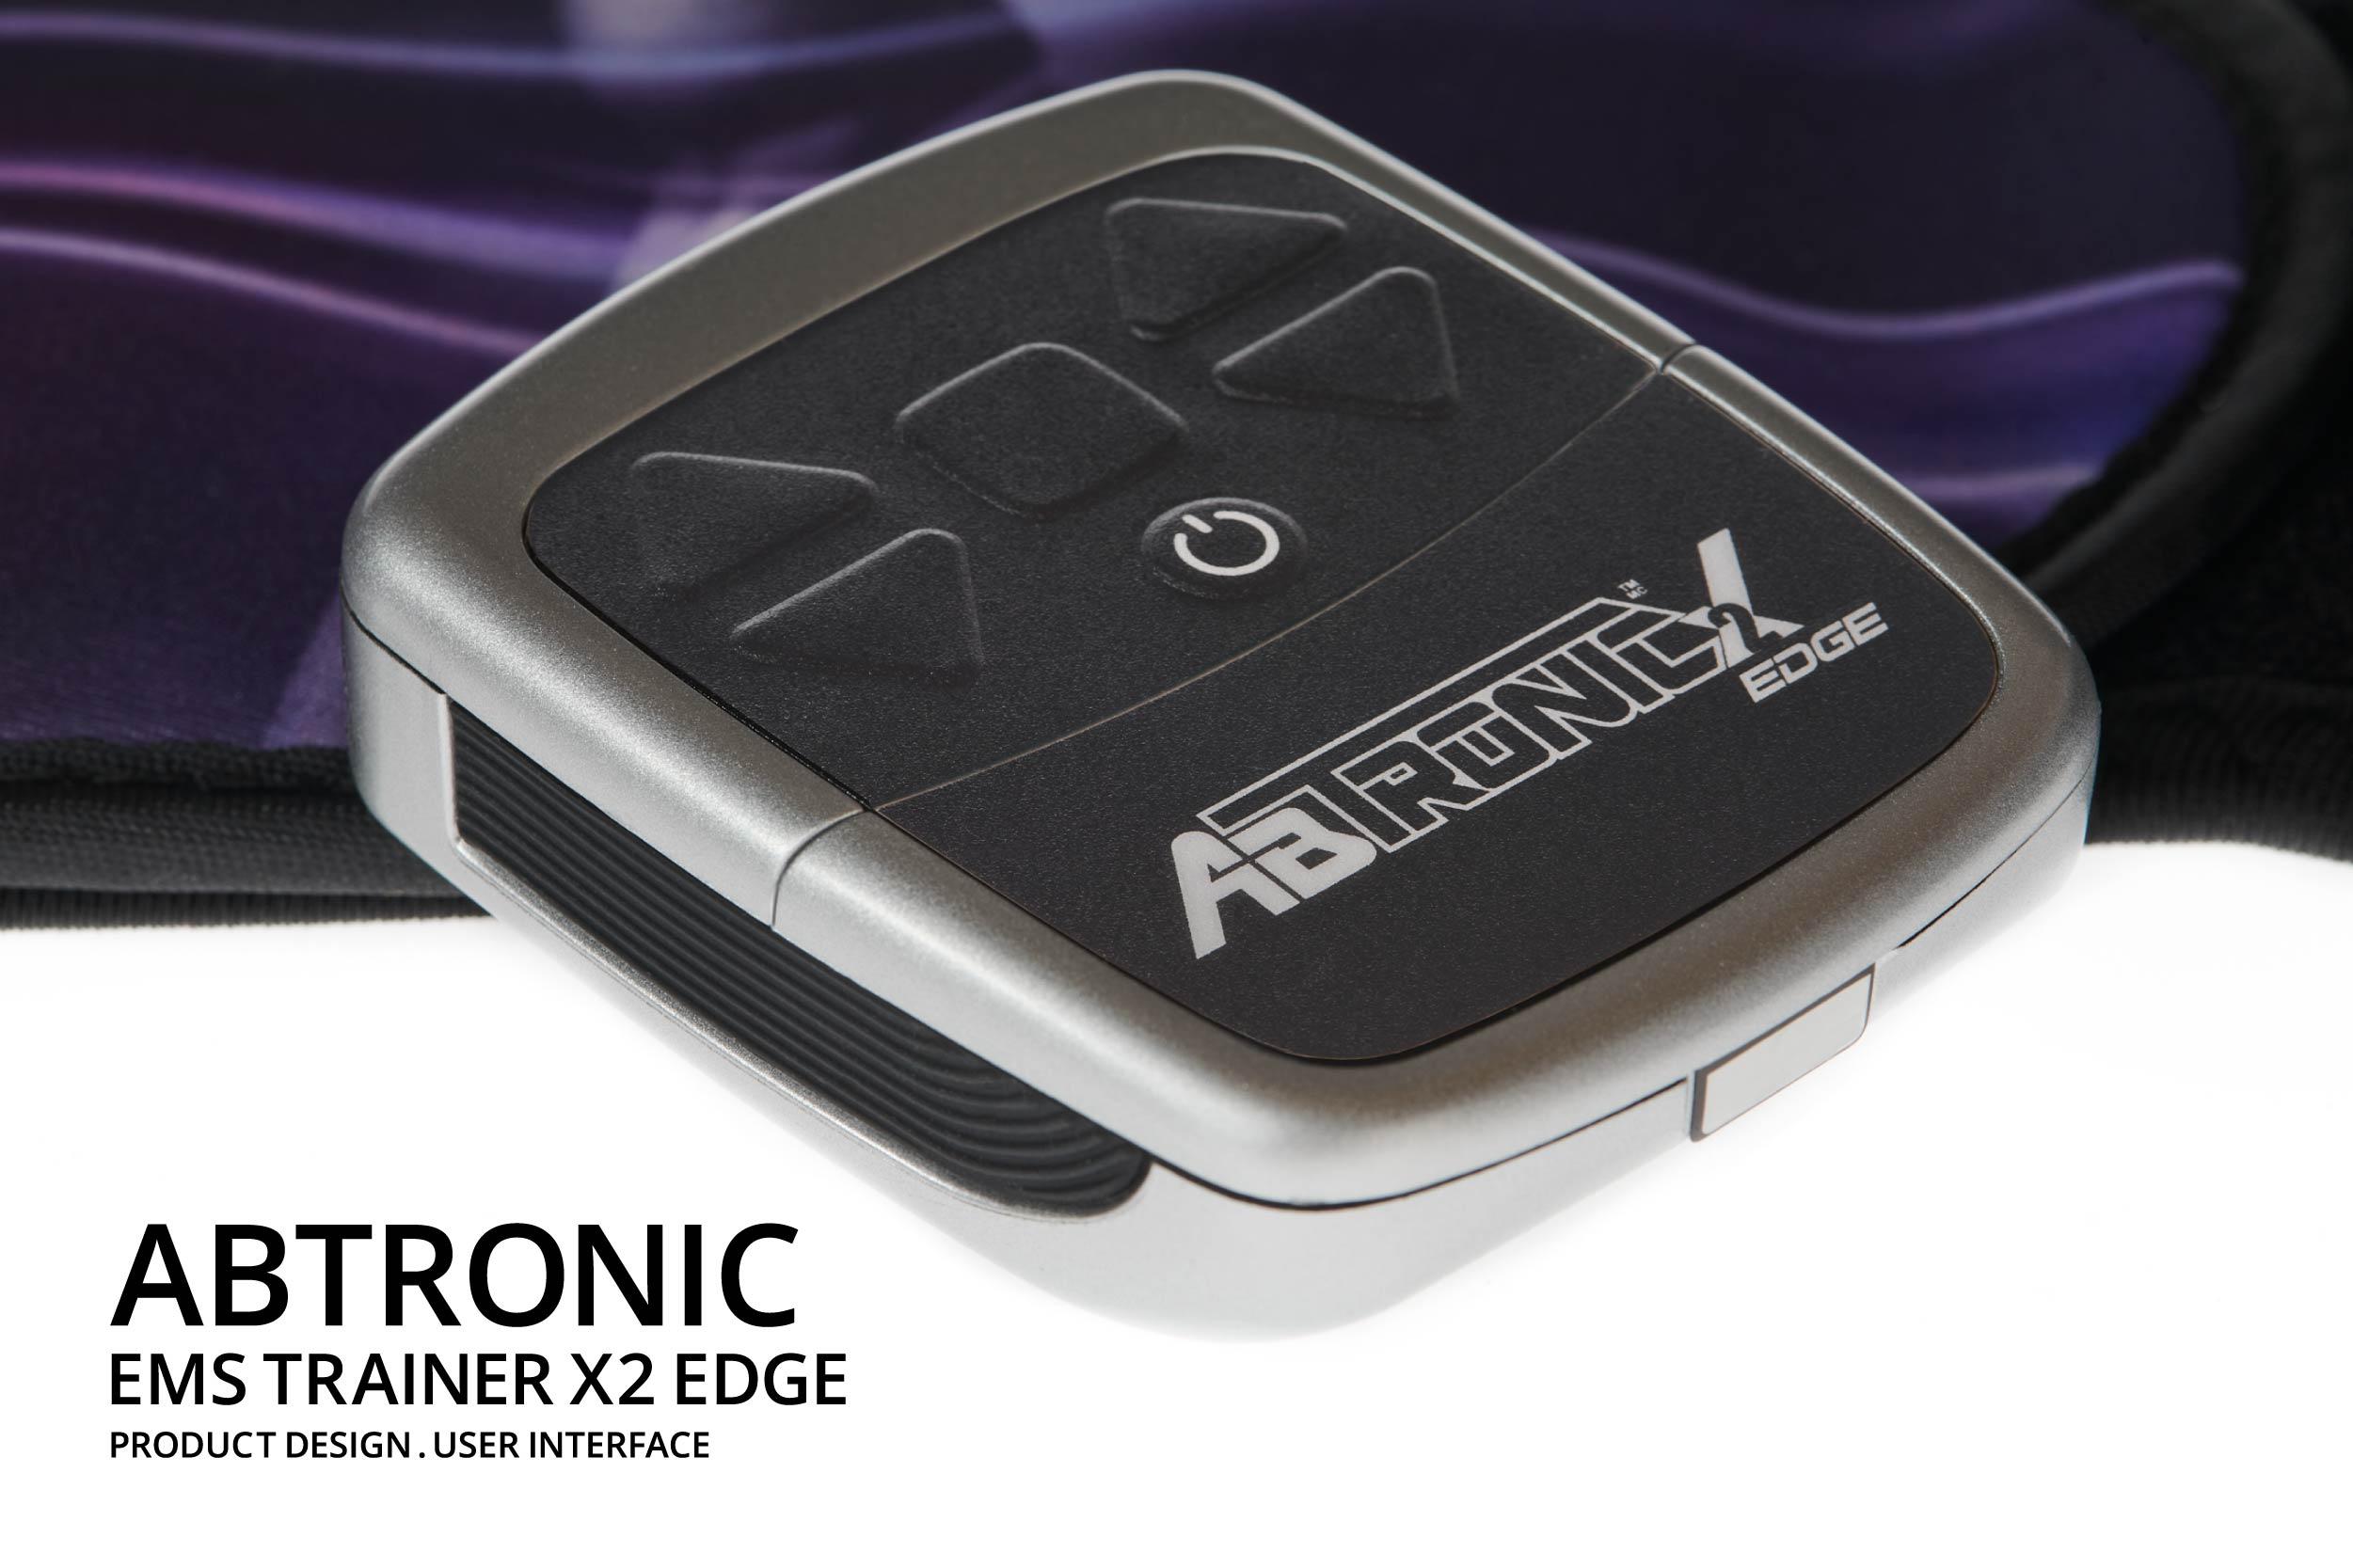 ABTRONIC-X2-EDGE-1